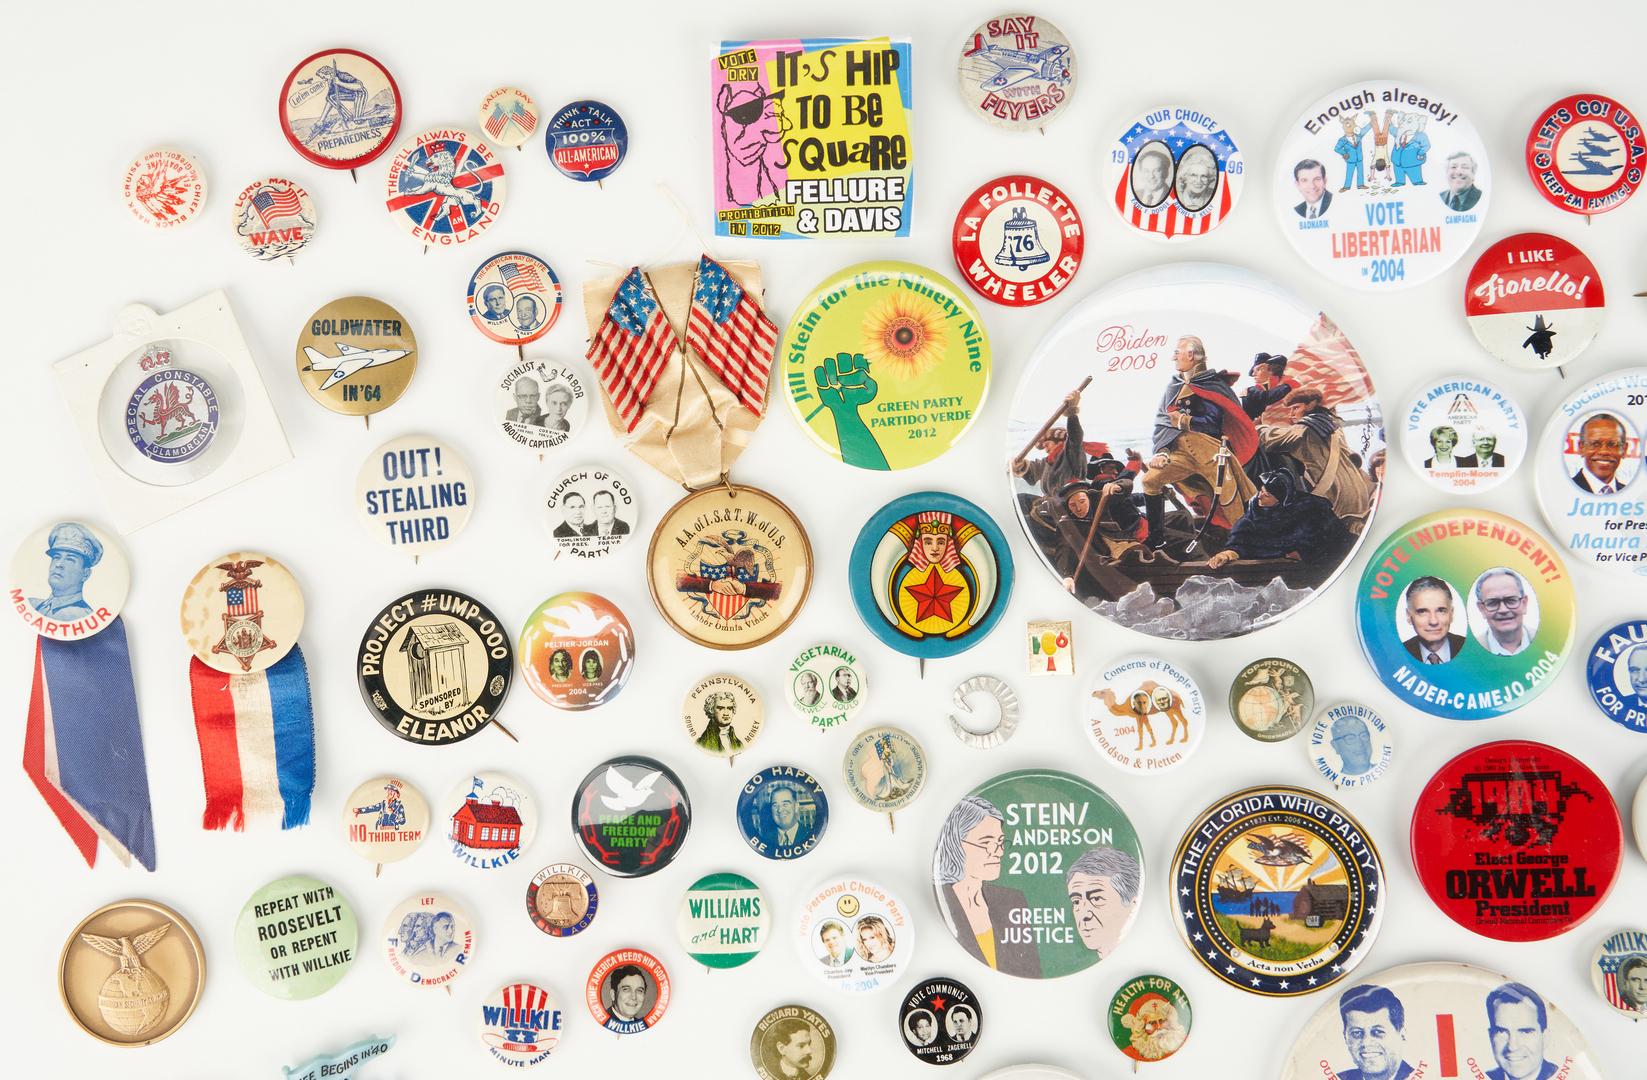 Lot 1005: 144 Political, War, and Misc. Ephemera Items, incl. Buttons